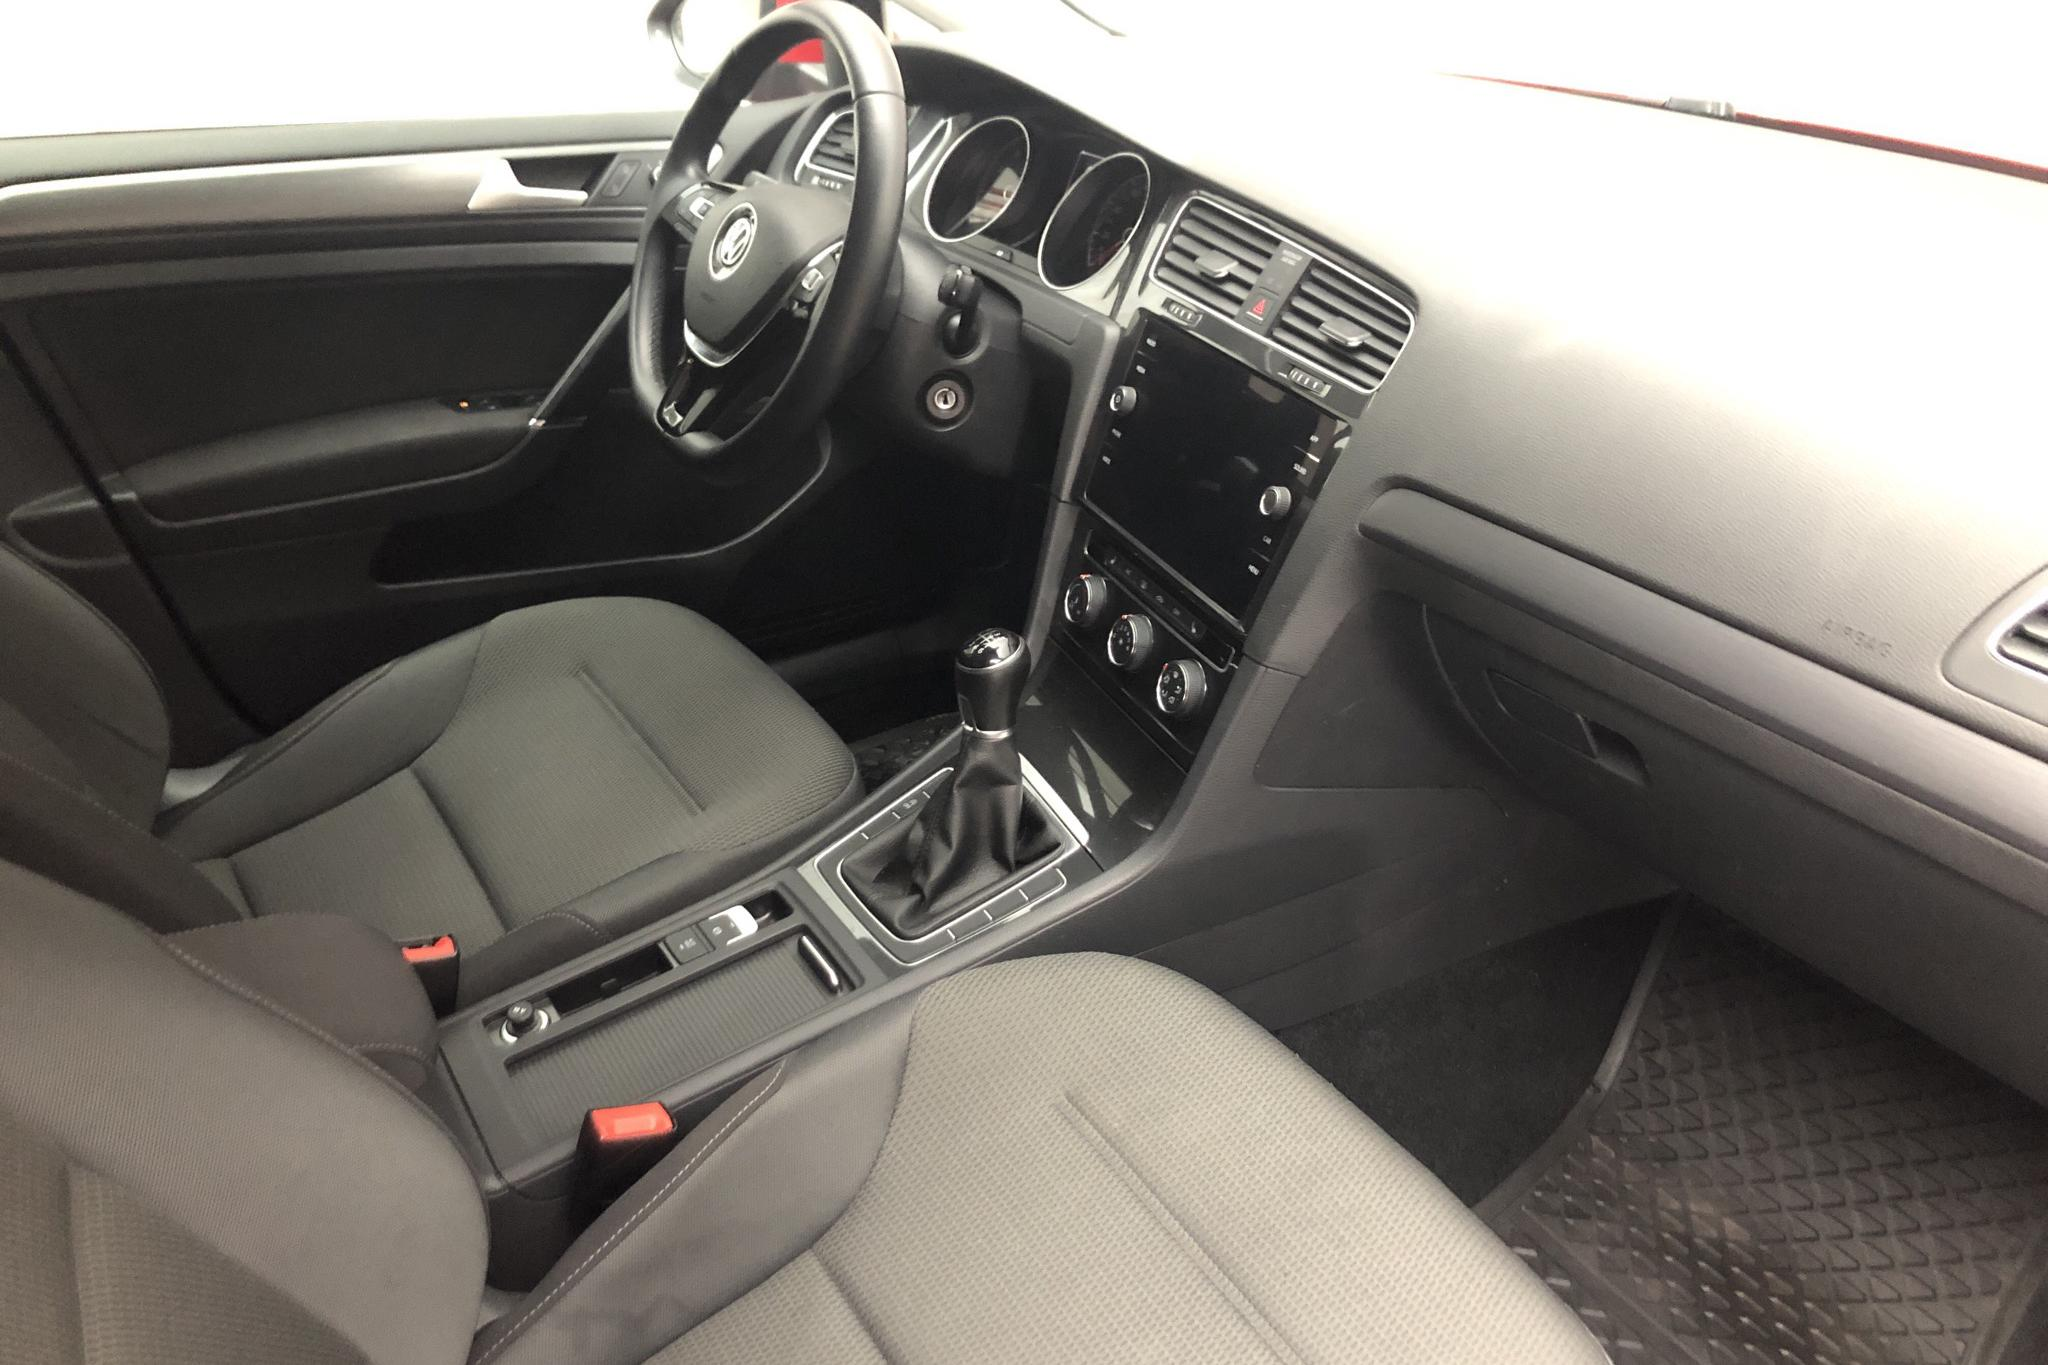 VW Golf VII 1.0 TSI 5dr (110hk) - 4 878 mil - Manuell - röd - 2018